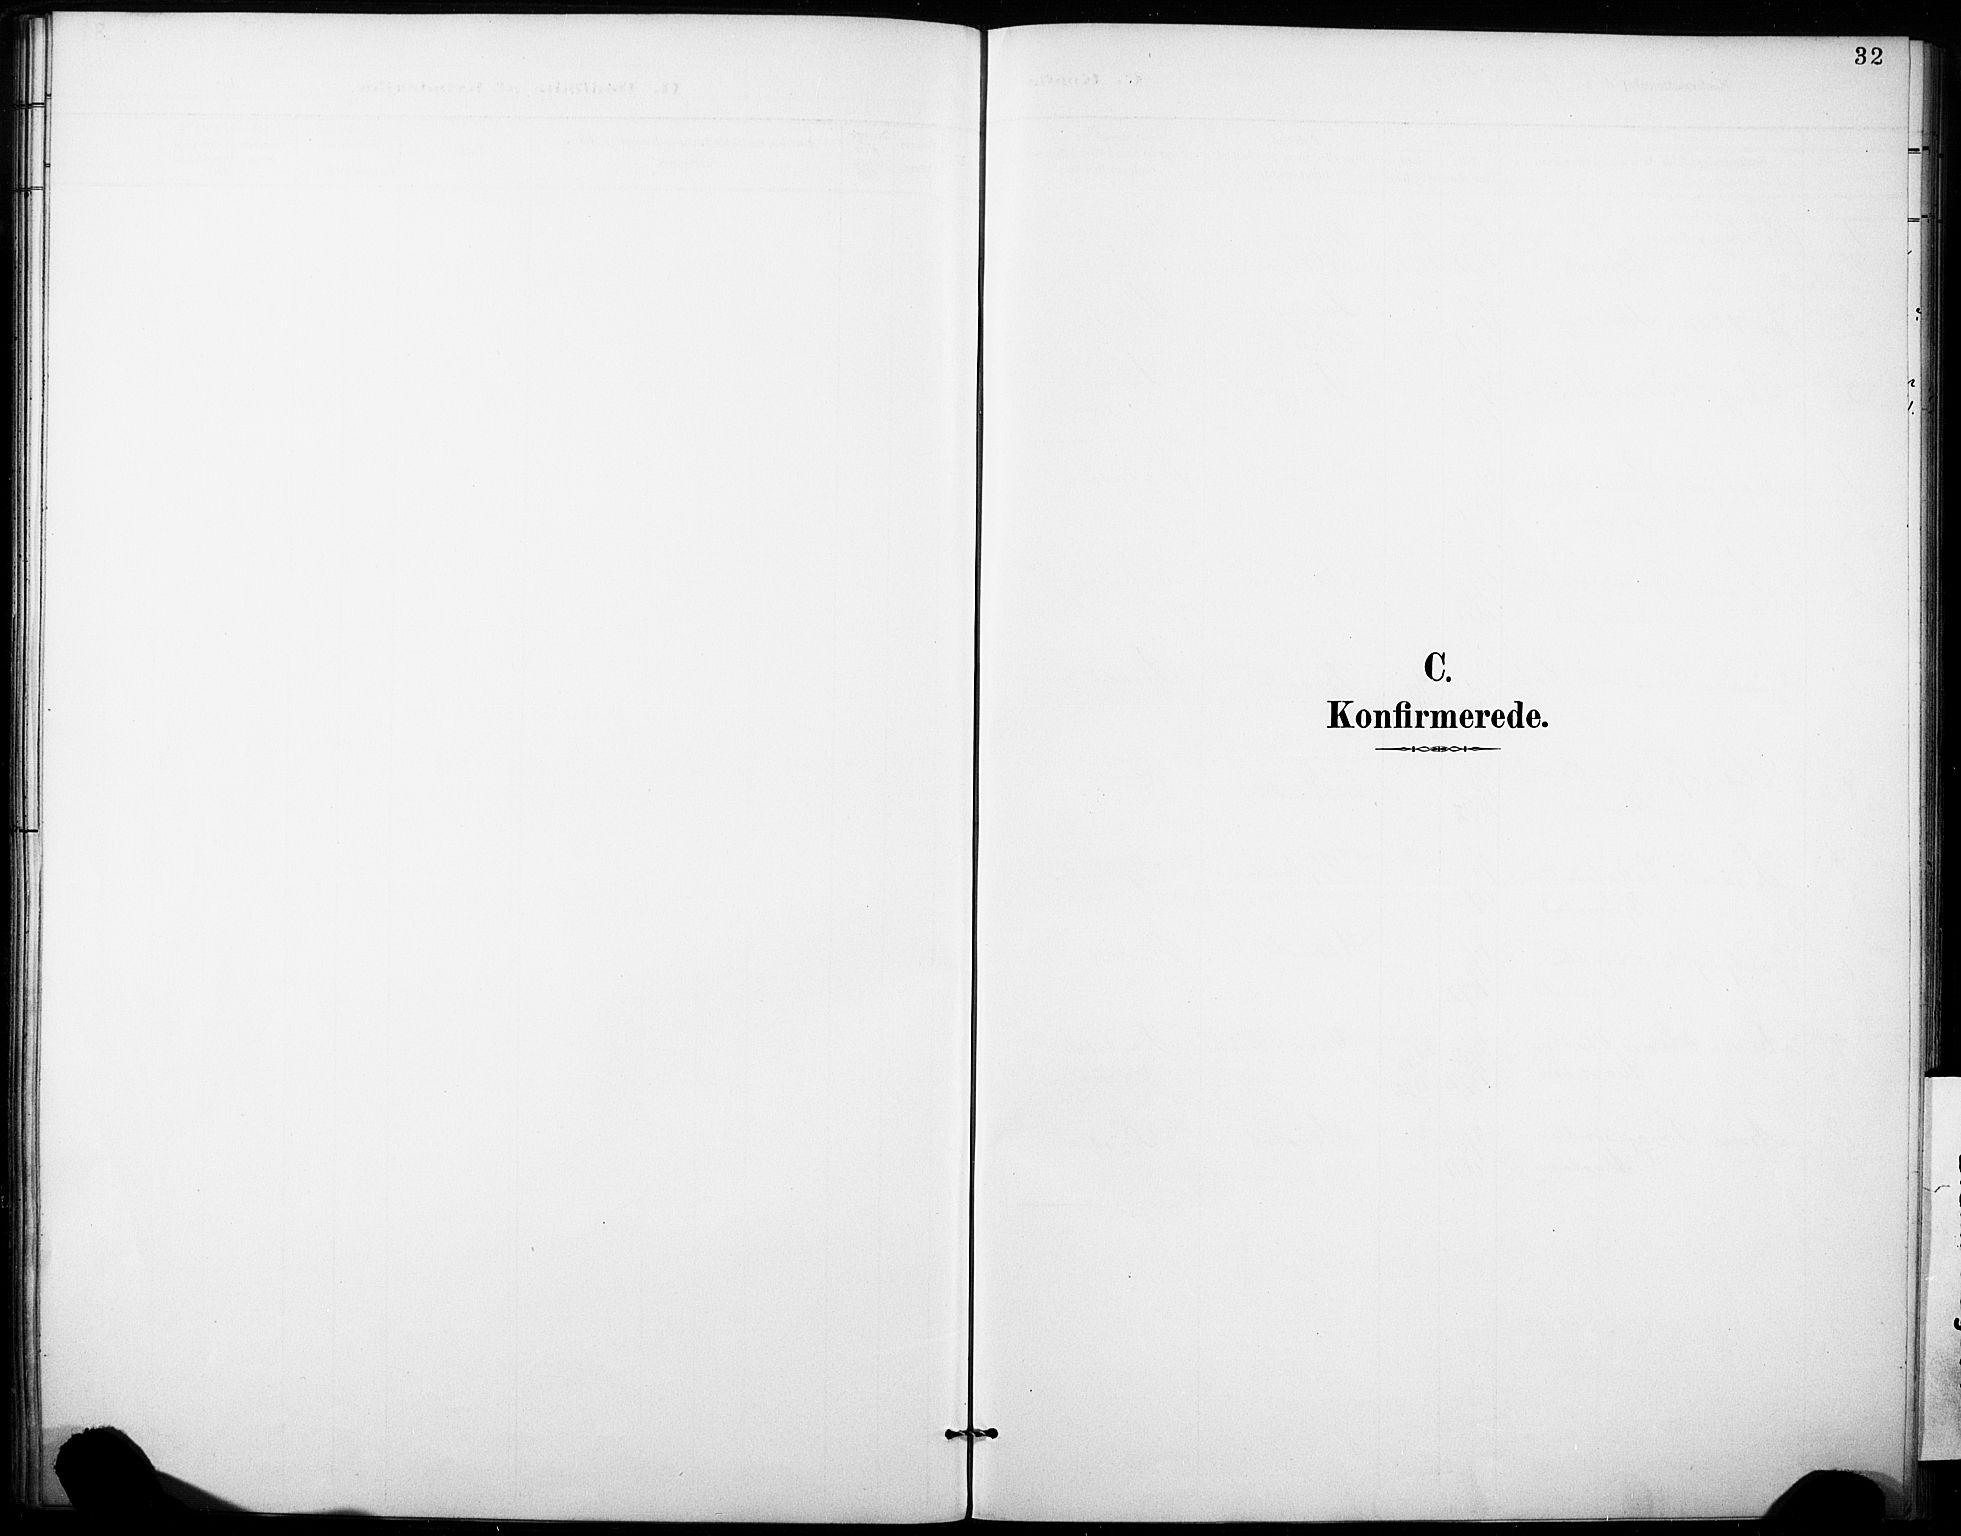 SAKO, Fyresdal kirkebøker, F/Fb/L0003: Ministerialbok nr. II 3, 1887-1903, s. 32